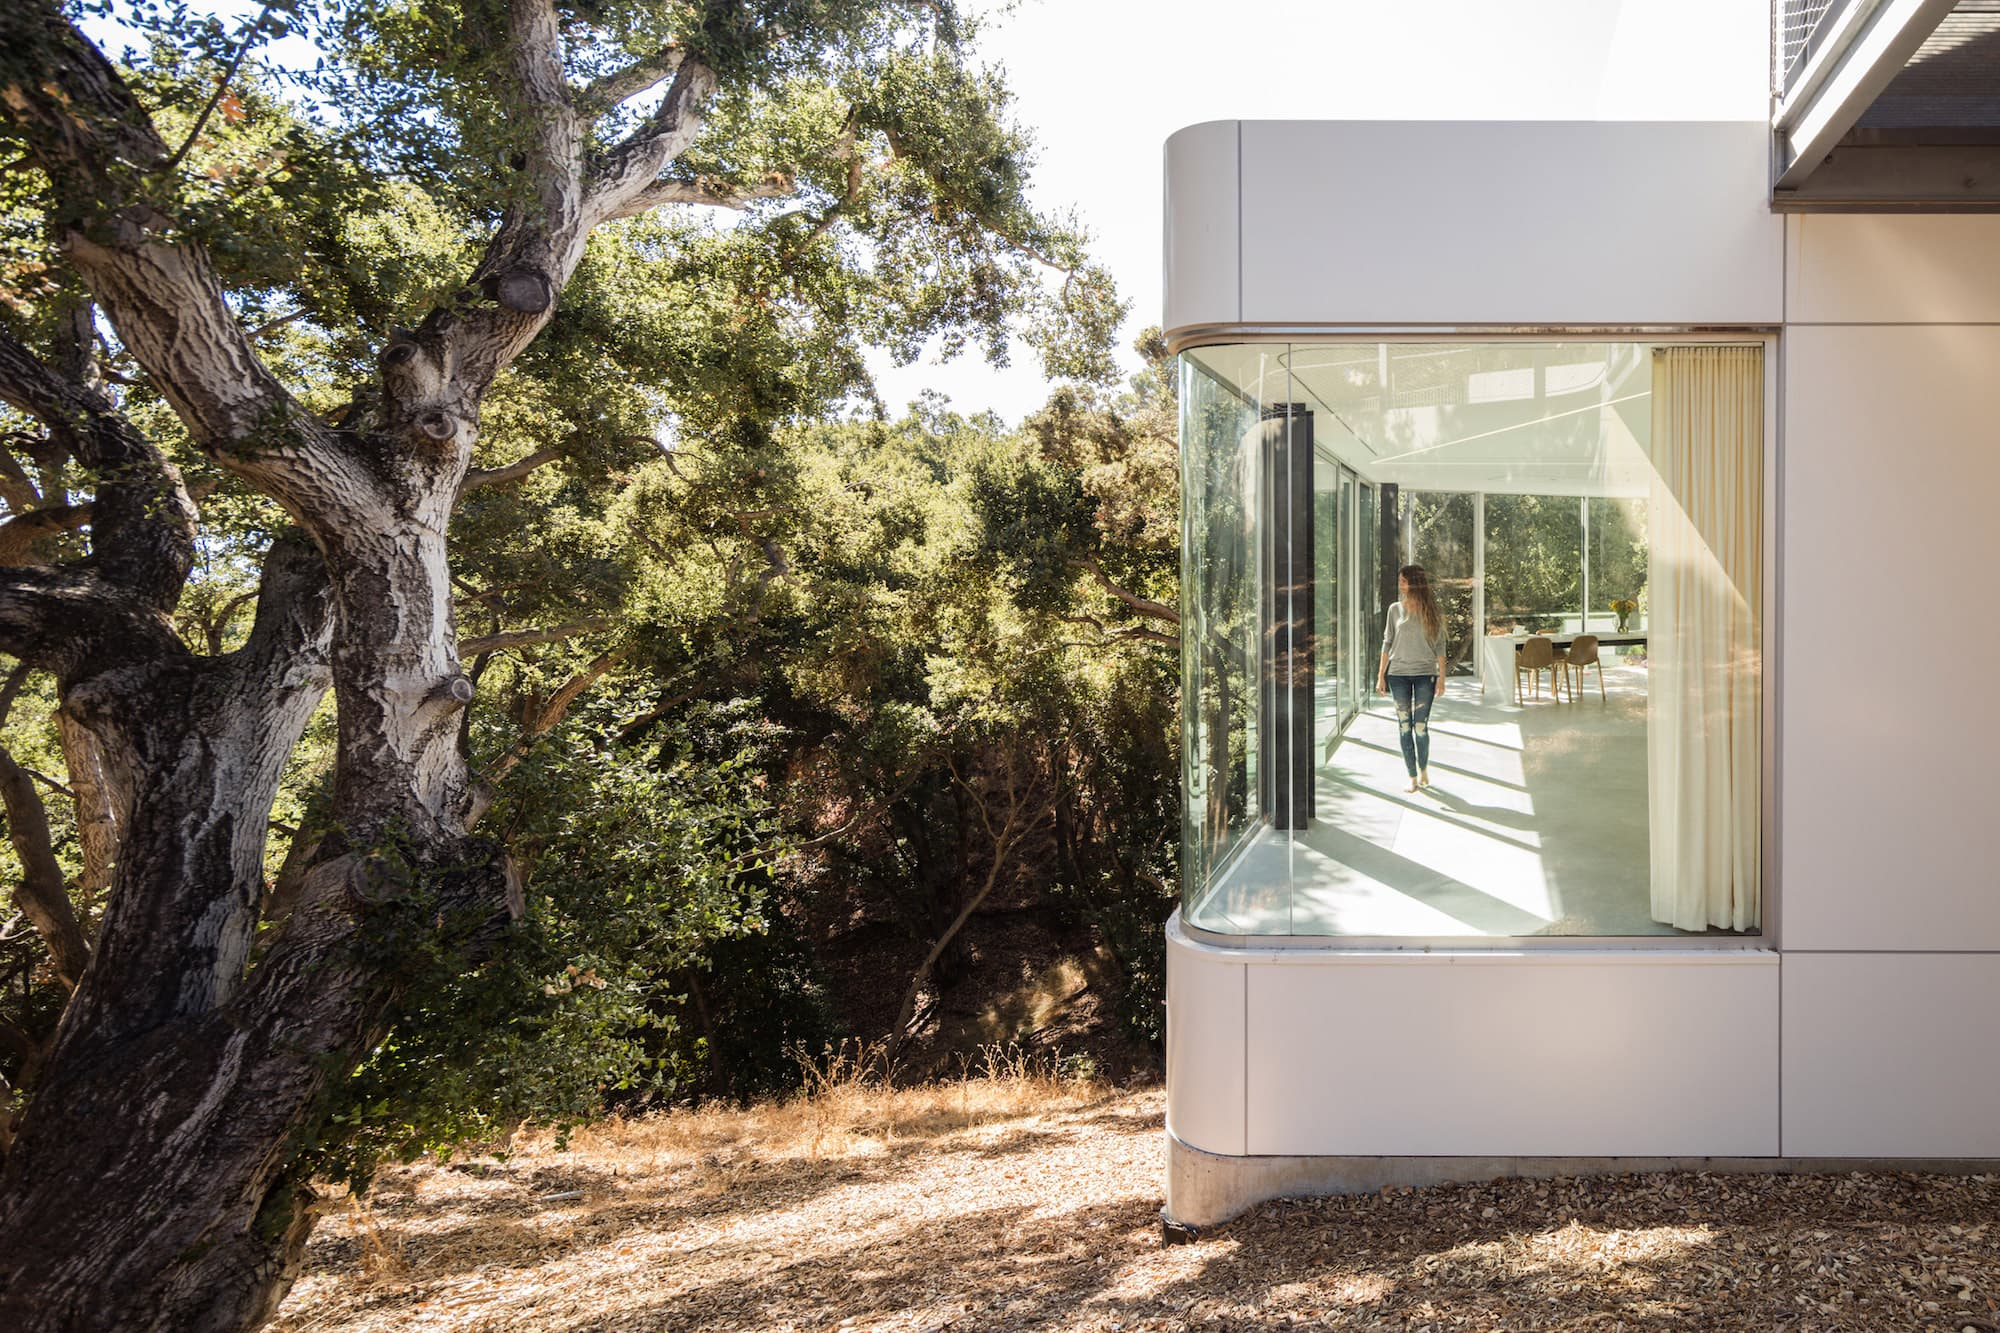 Licht ist Leben: Pam & Paul's House by Craig Steely Architecture 10